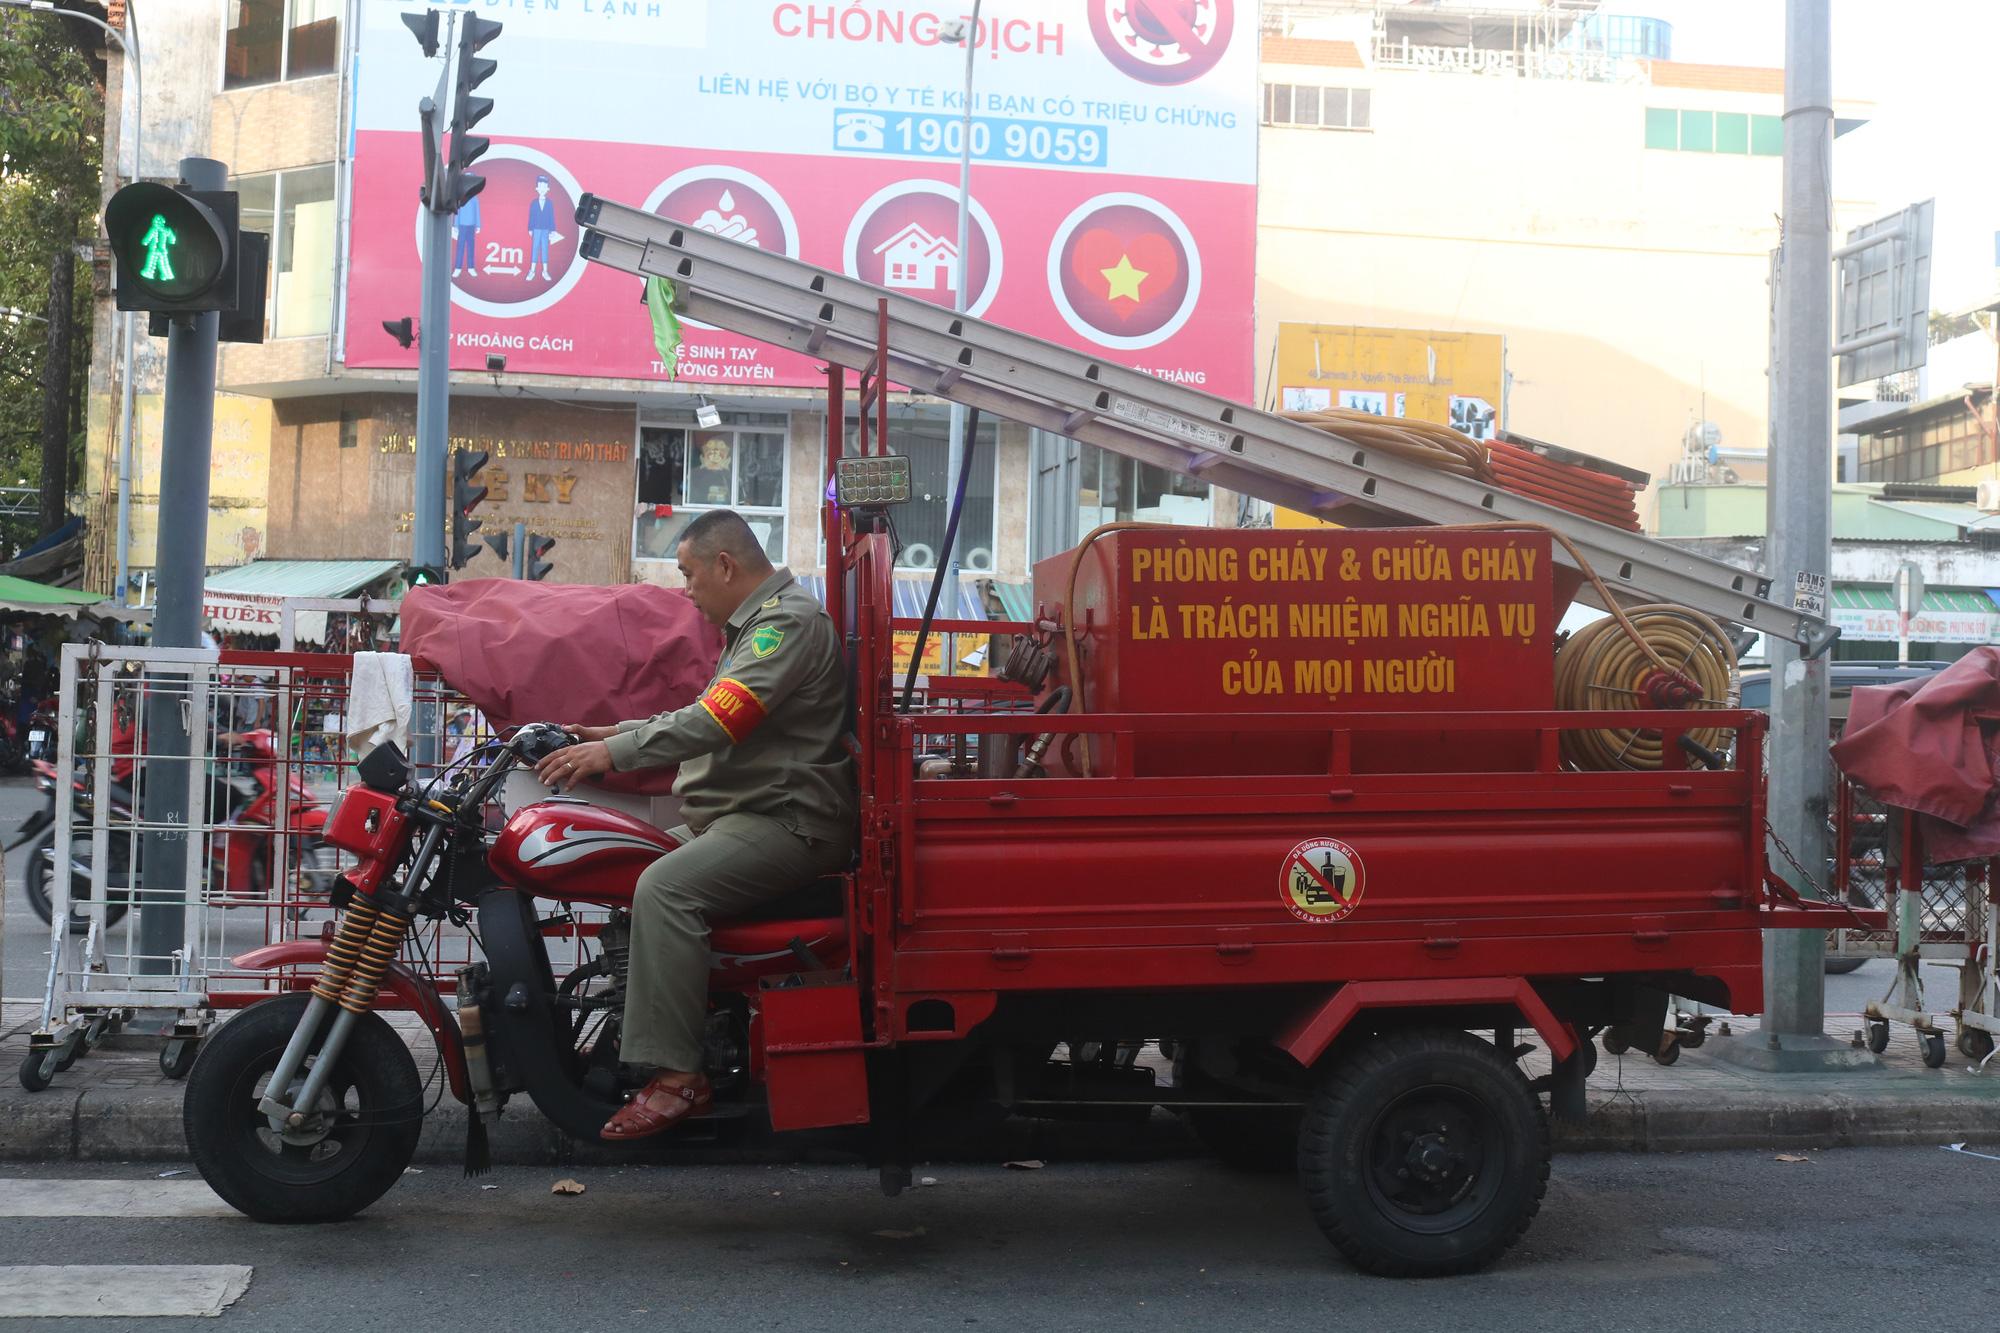 Meet creator of mini 'fire engine' designed for Saigon's narrow alleys